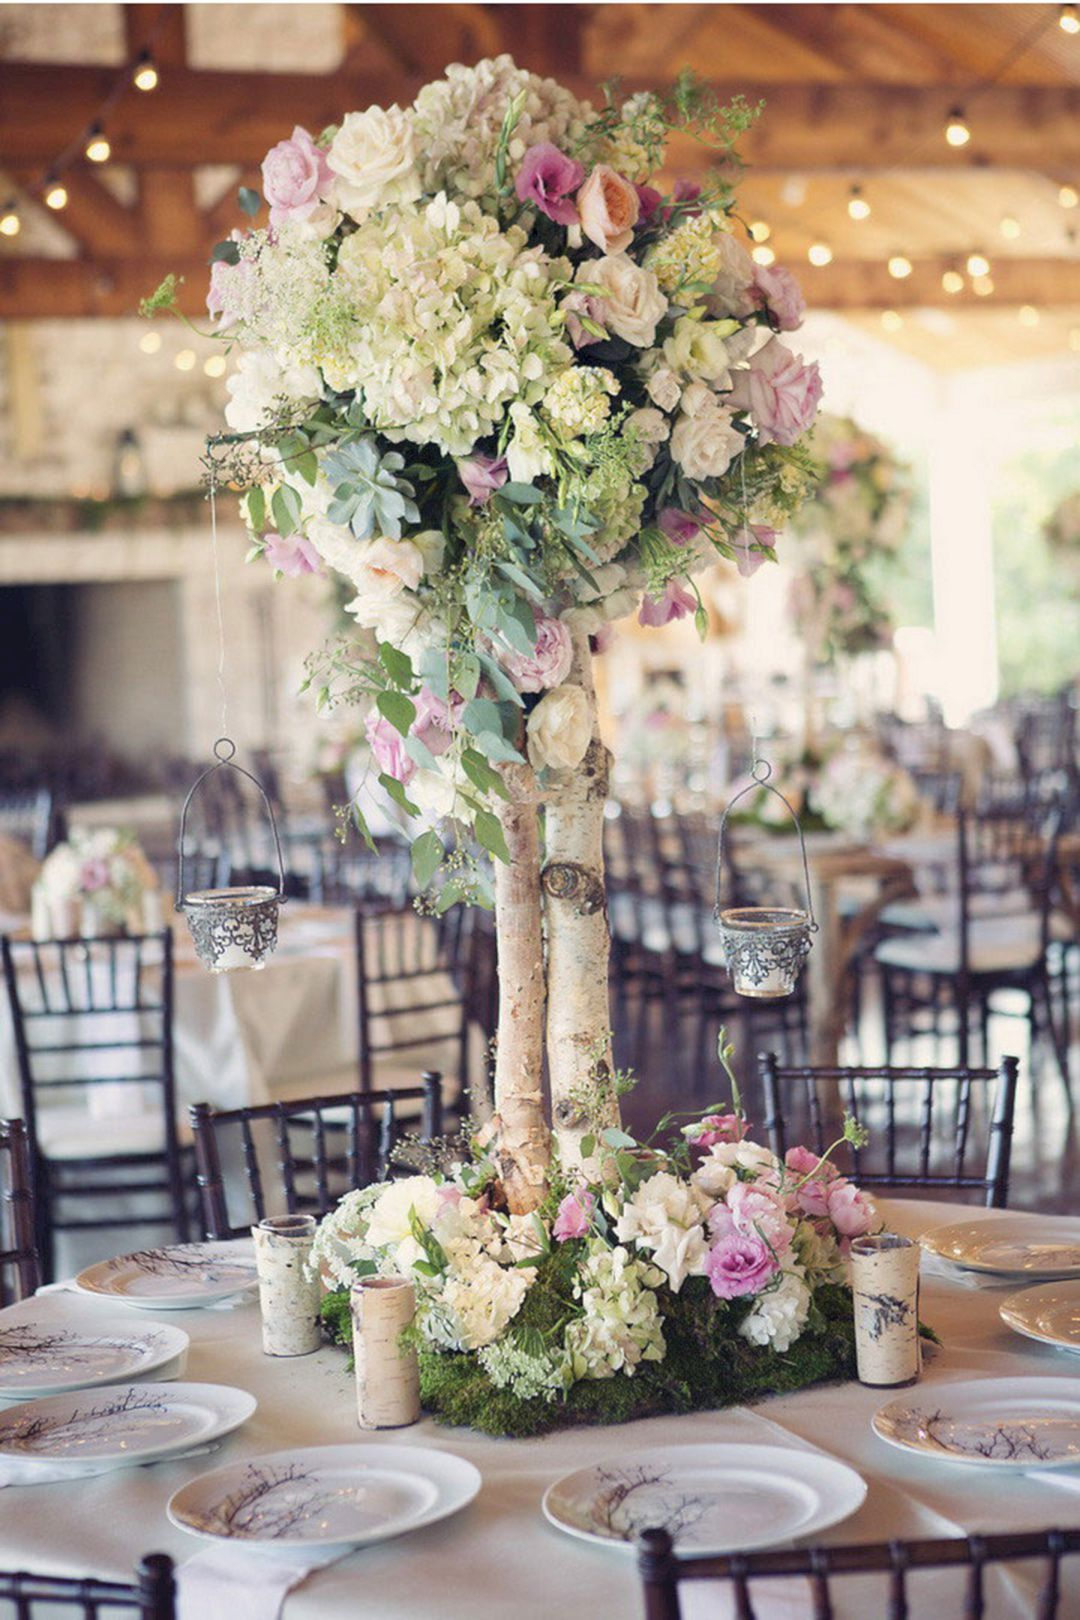 Wedding decoration ideas rustic   Awesome Rustic Wedding Centerpieces Ideas  Rustic wedding